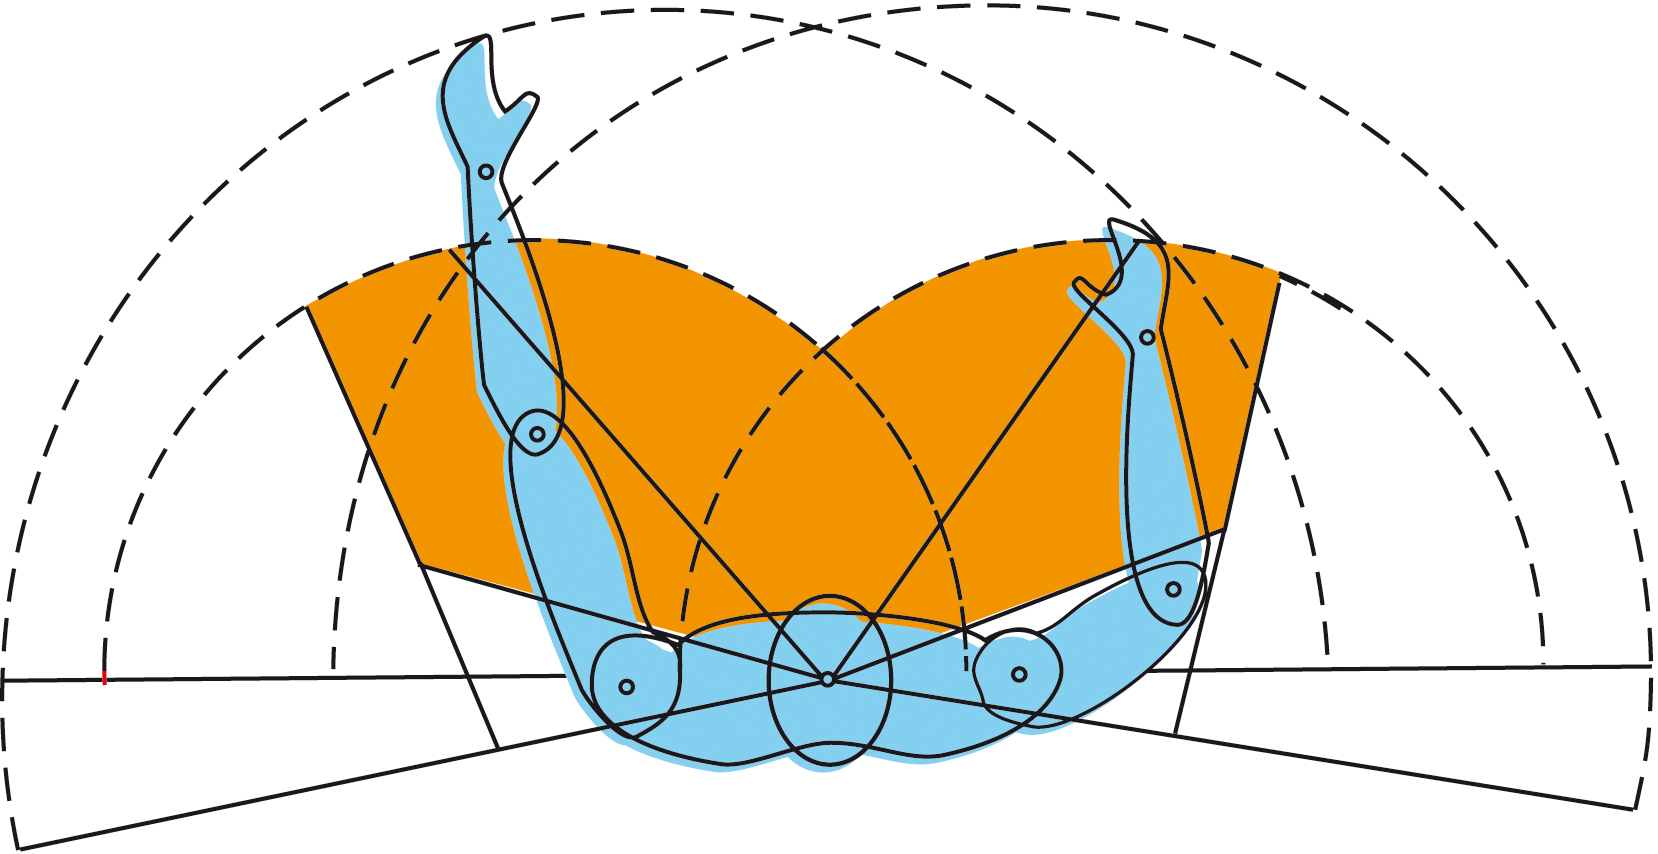 File ergonom a reas operativas de la simetr a bilateral for Espacio de trabajo ergonomia